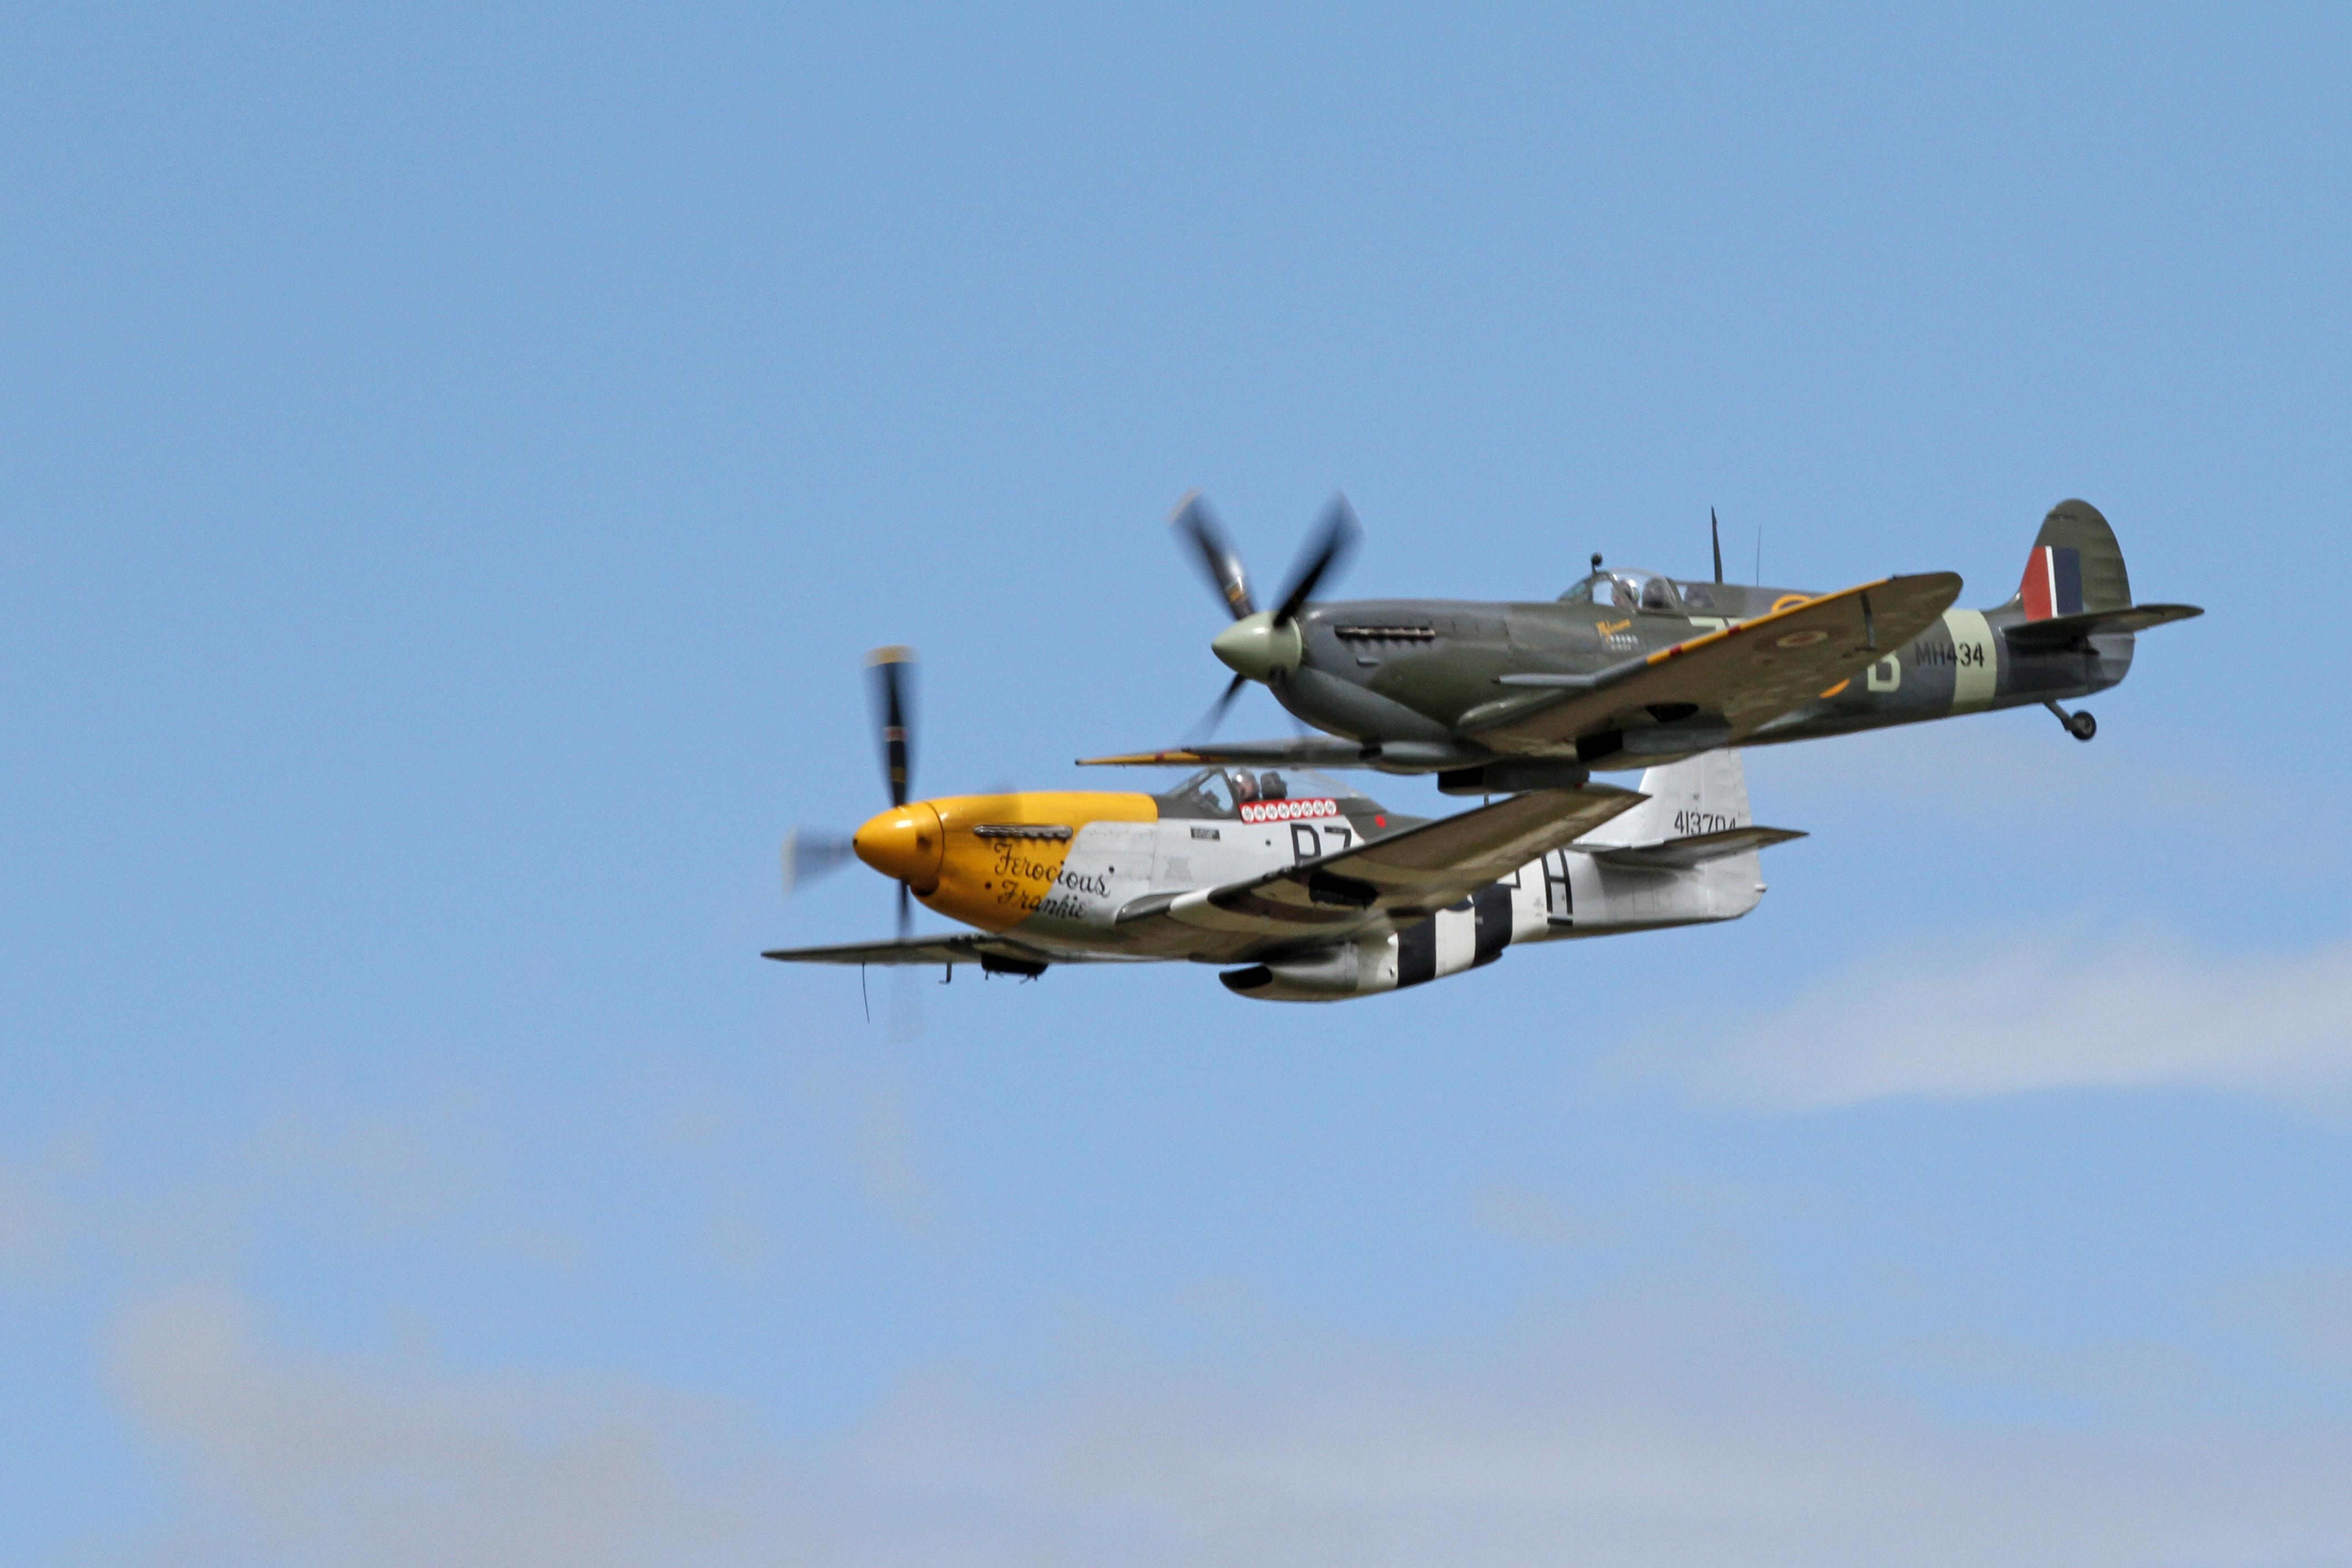 Supermarine_Spitfire_MkIIa_&_North_American_P-51_Mustang_05_(5968988206).jpg